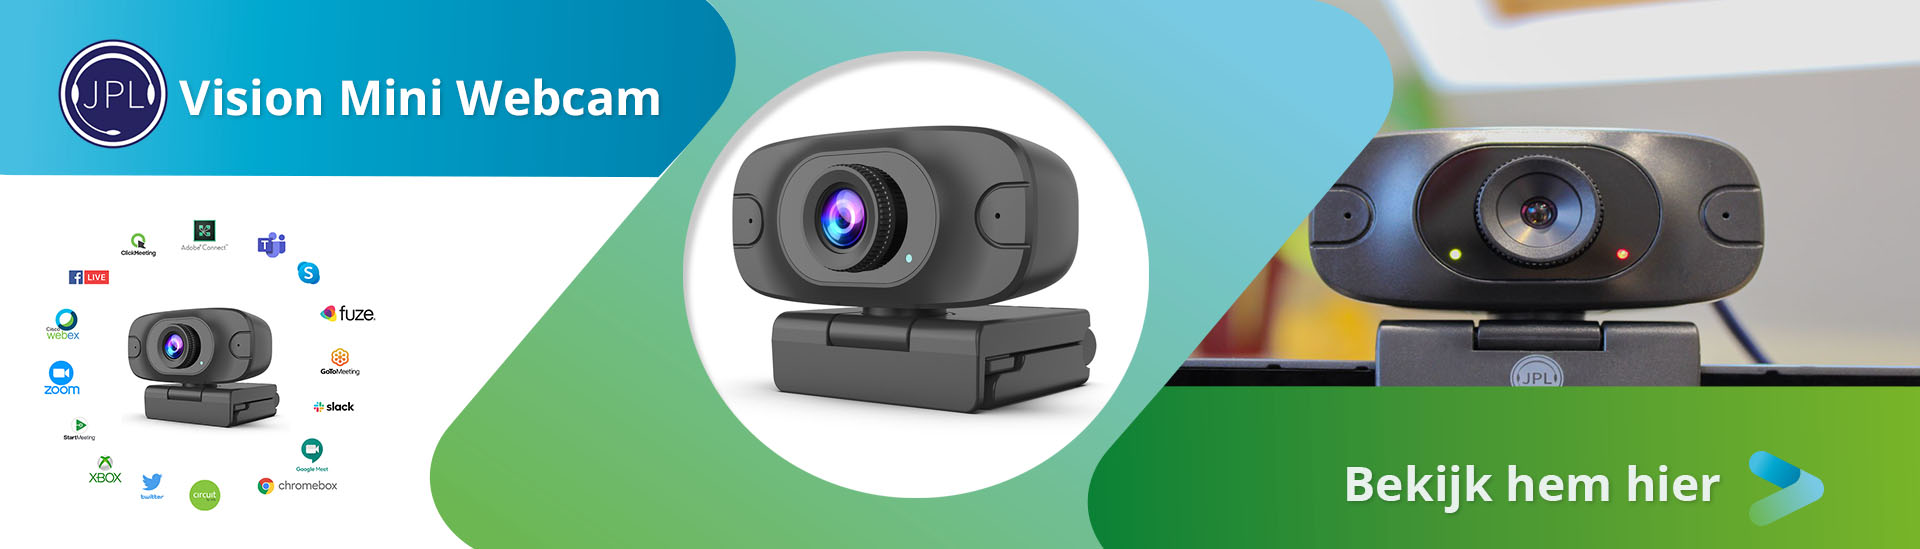 JPL Vision Mini Webcam 1080p - 30FPS Plug en play USB-A